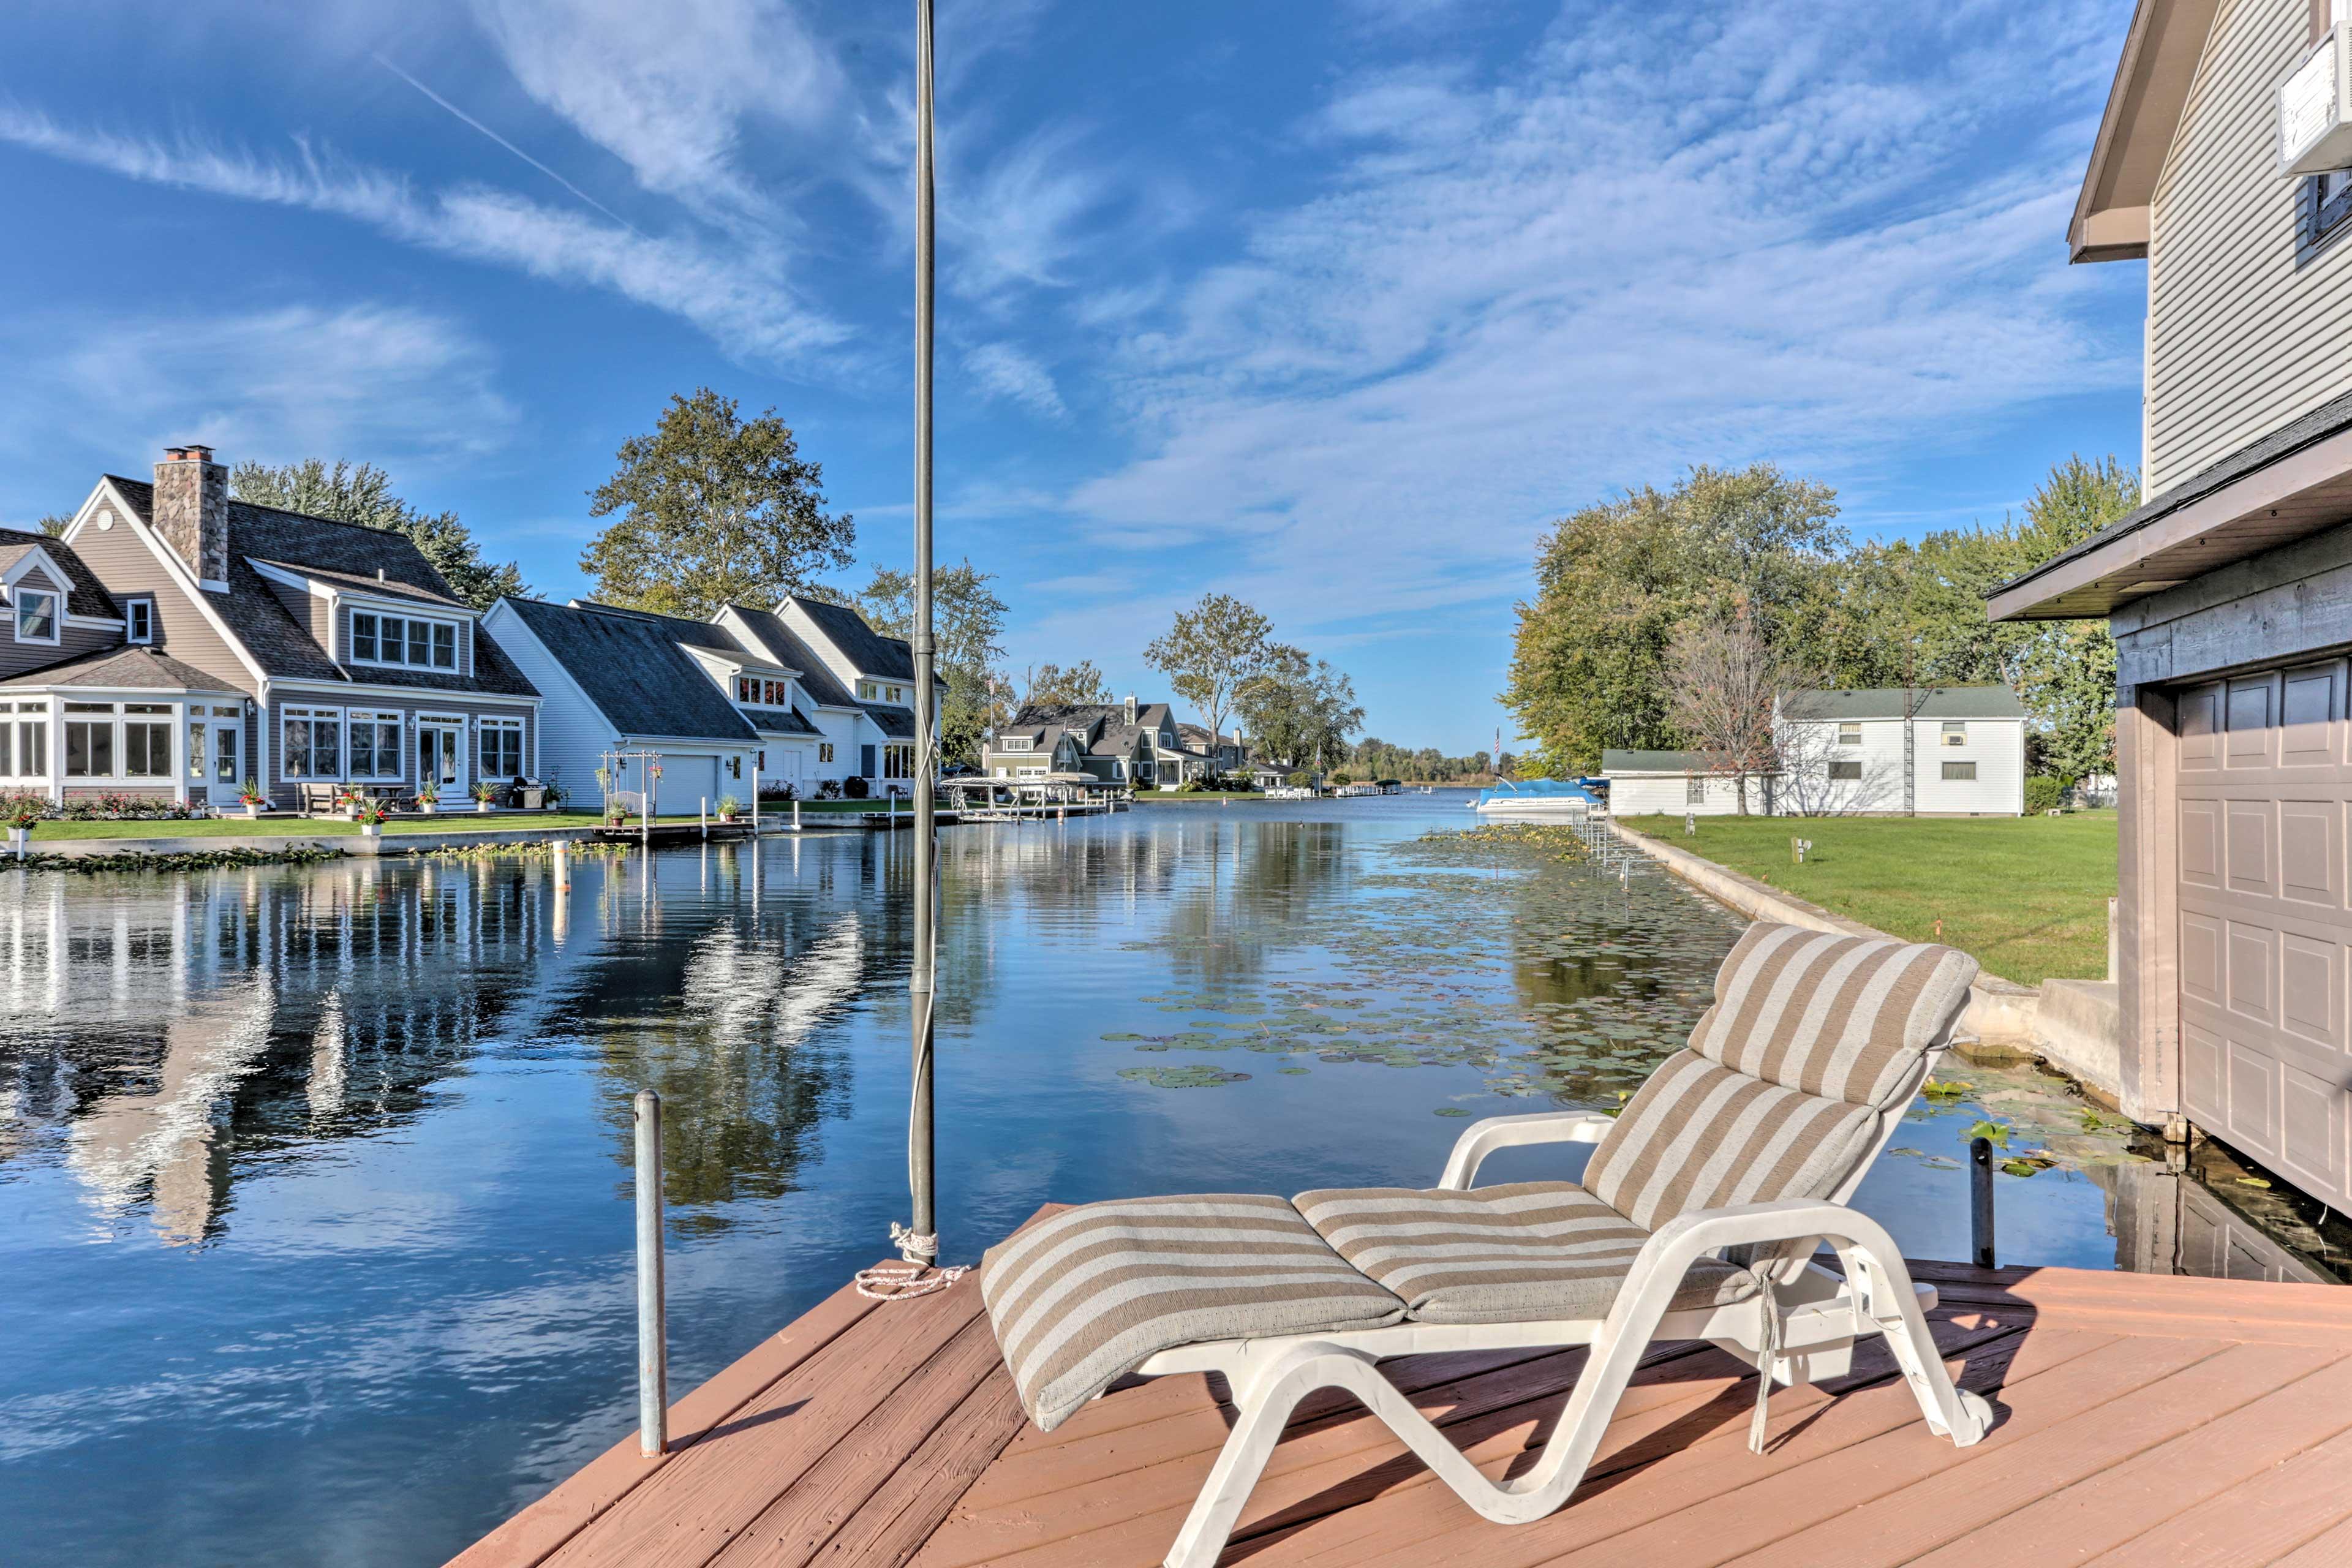 Syracuse Vacation Rental | 2BR | 1BA | 600 Sq Ft | 1 Story